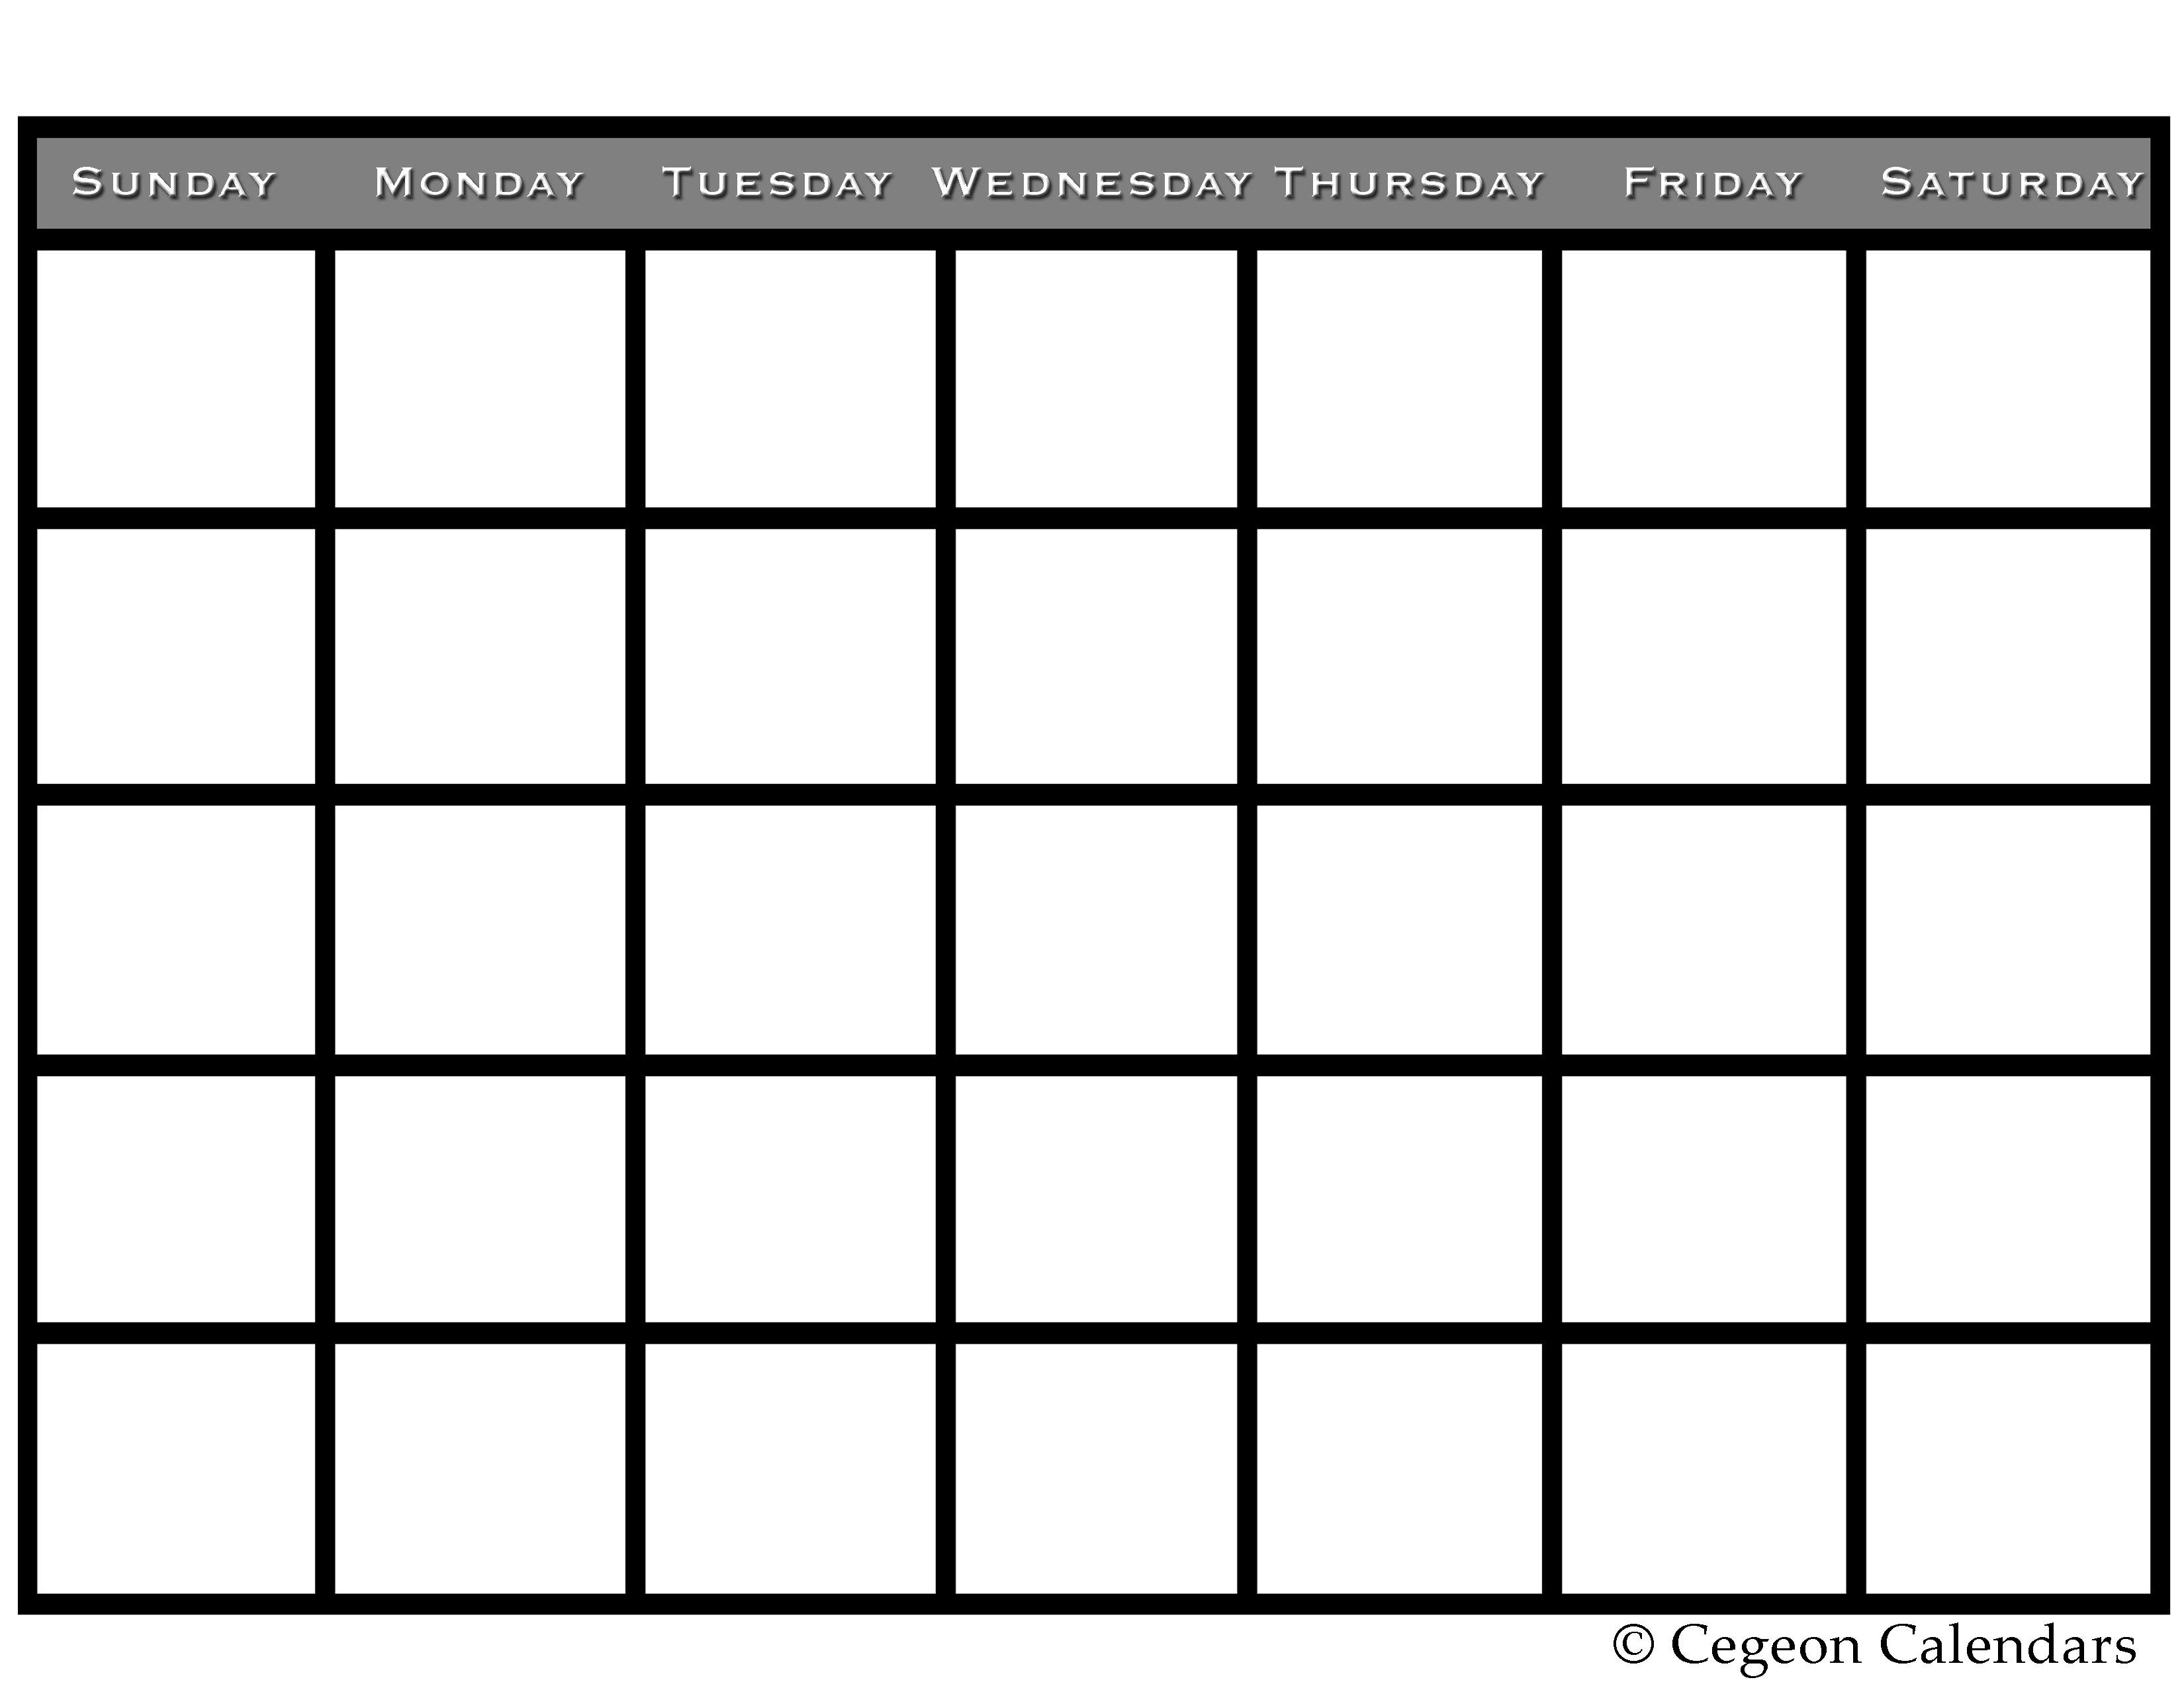 Get Your Free Printable Blank Calendar Printables Pinterest